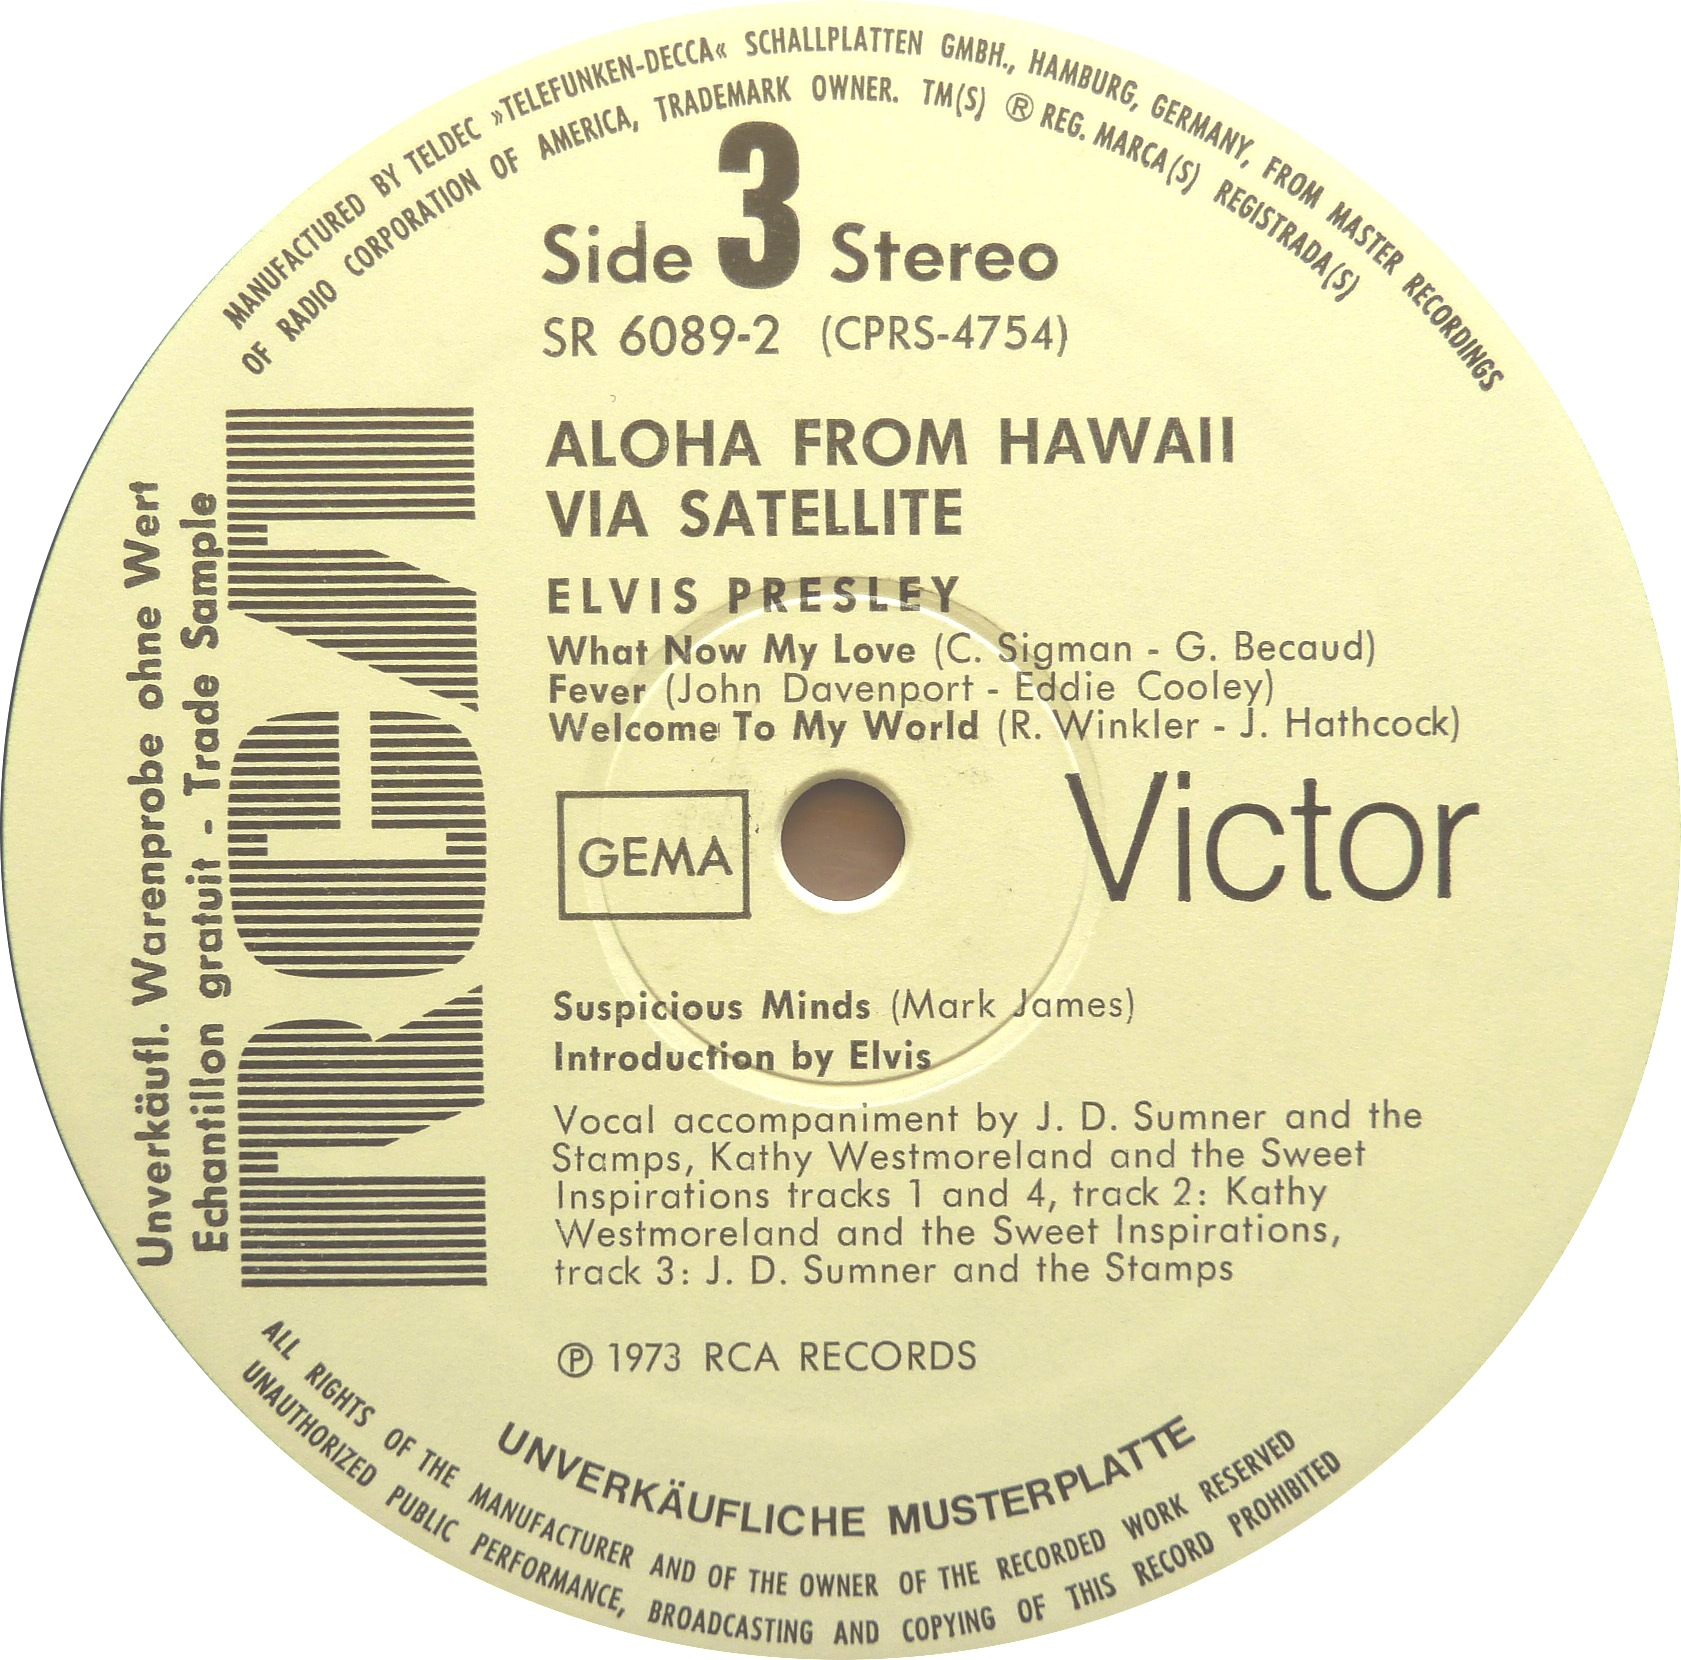 ALOHA FROM HAWAII VIA SATELLITE  Afh73promoside3g3kx2